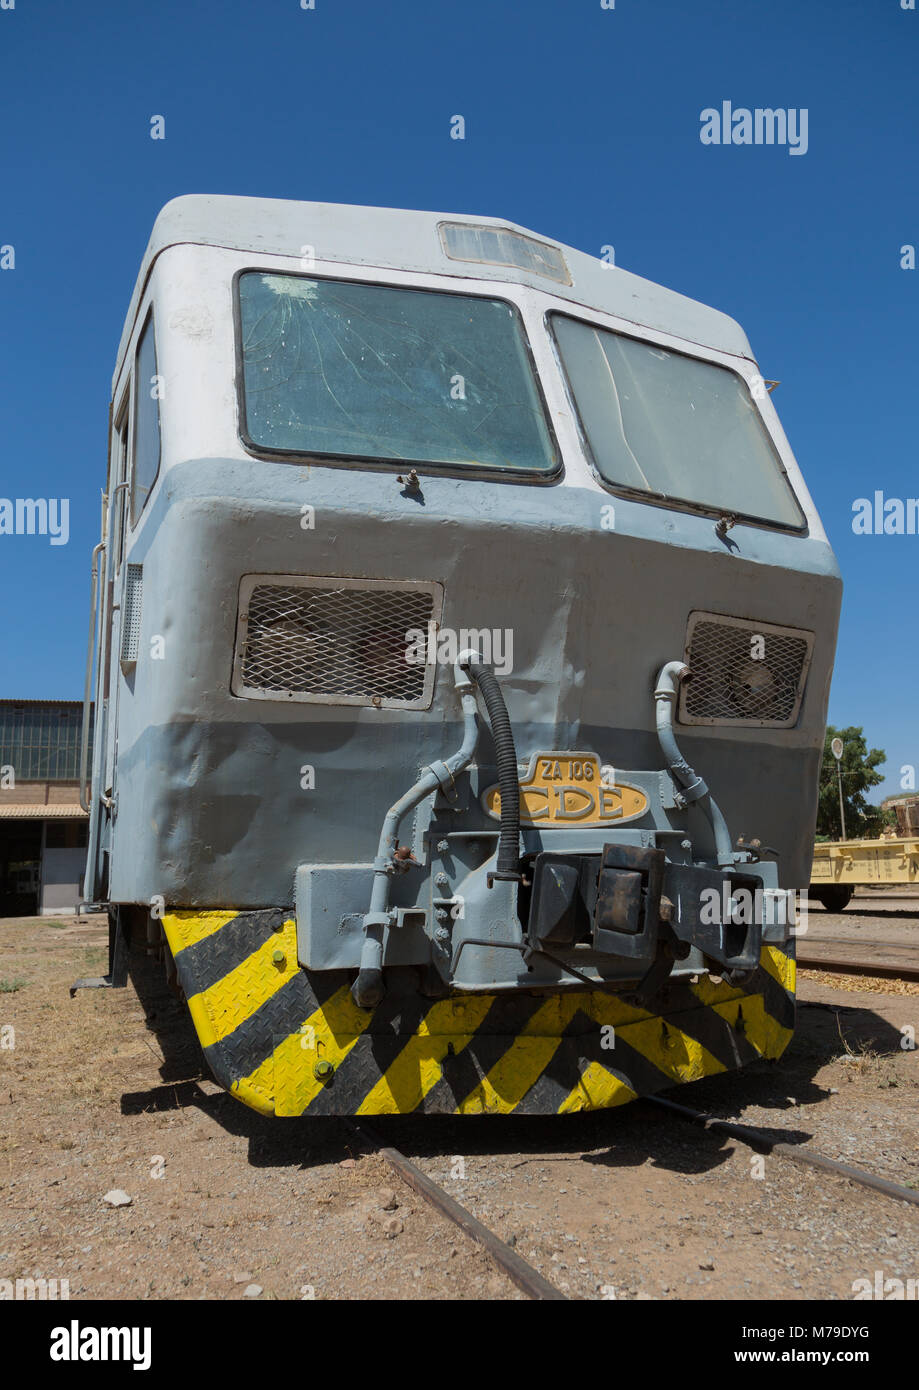 Cars of the ethio-djibouti railway station, Dire dawa region, Dire